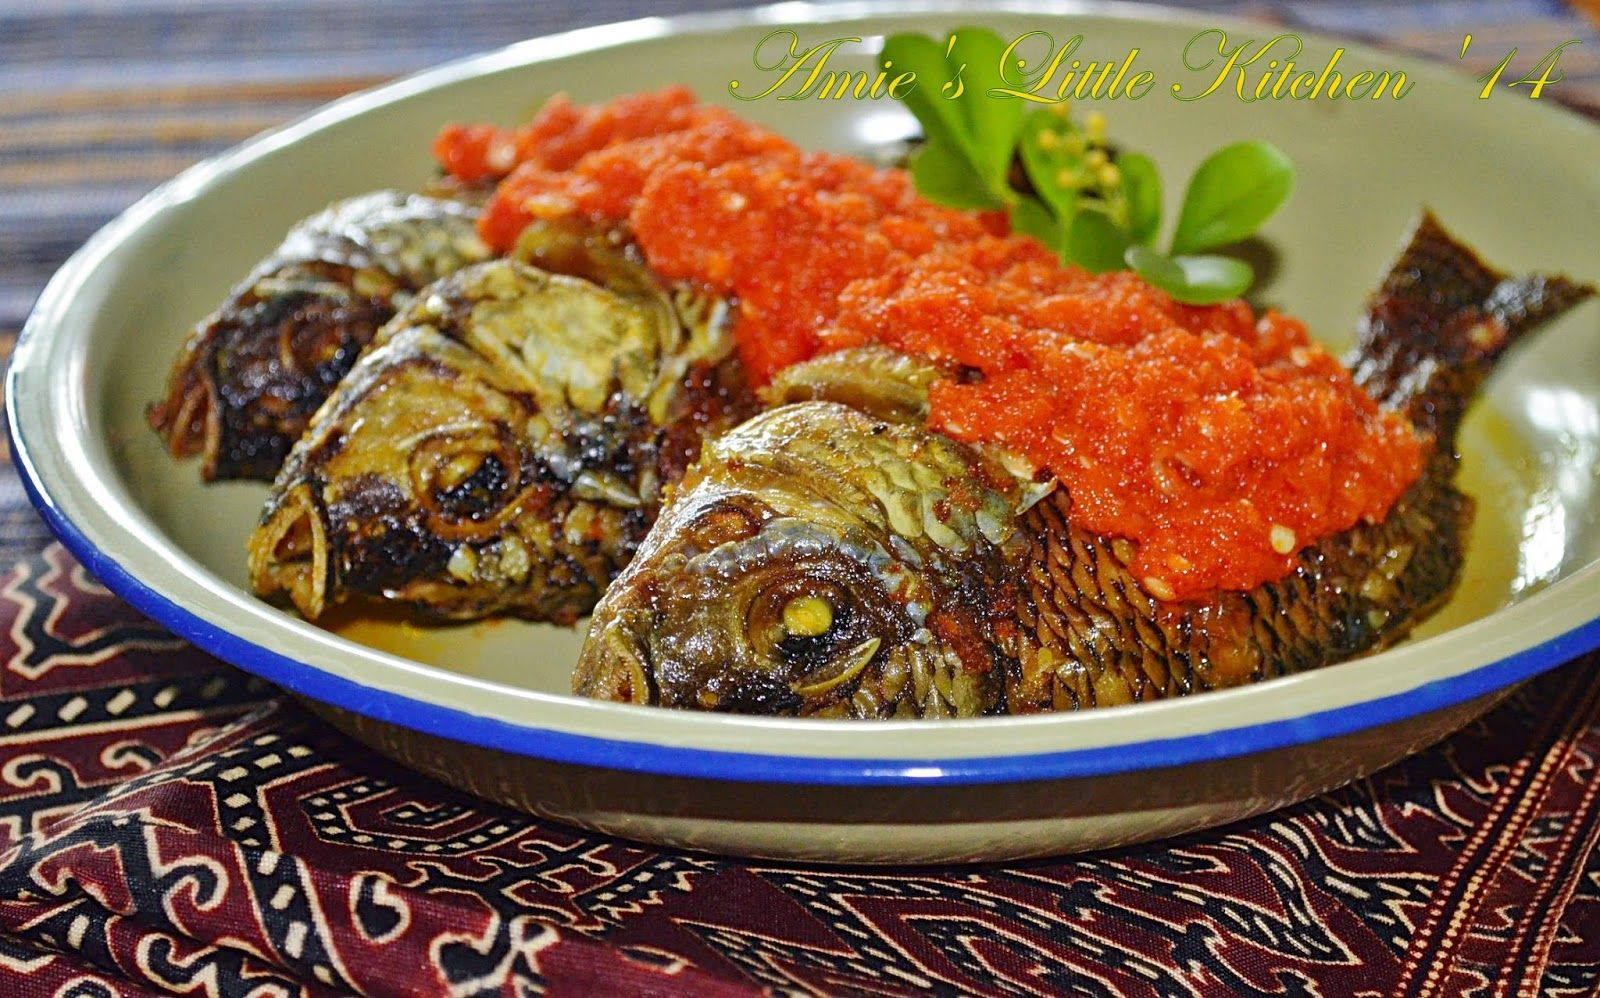 masak ikan talapia bakar hans cooking recipes Resepi Mee Udon Goreng Enak dan Mudah